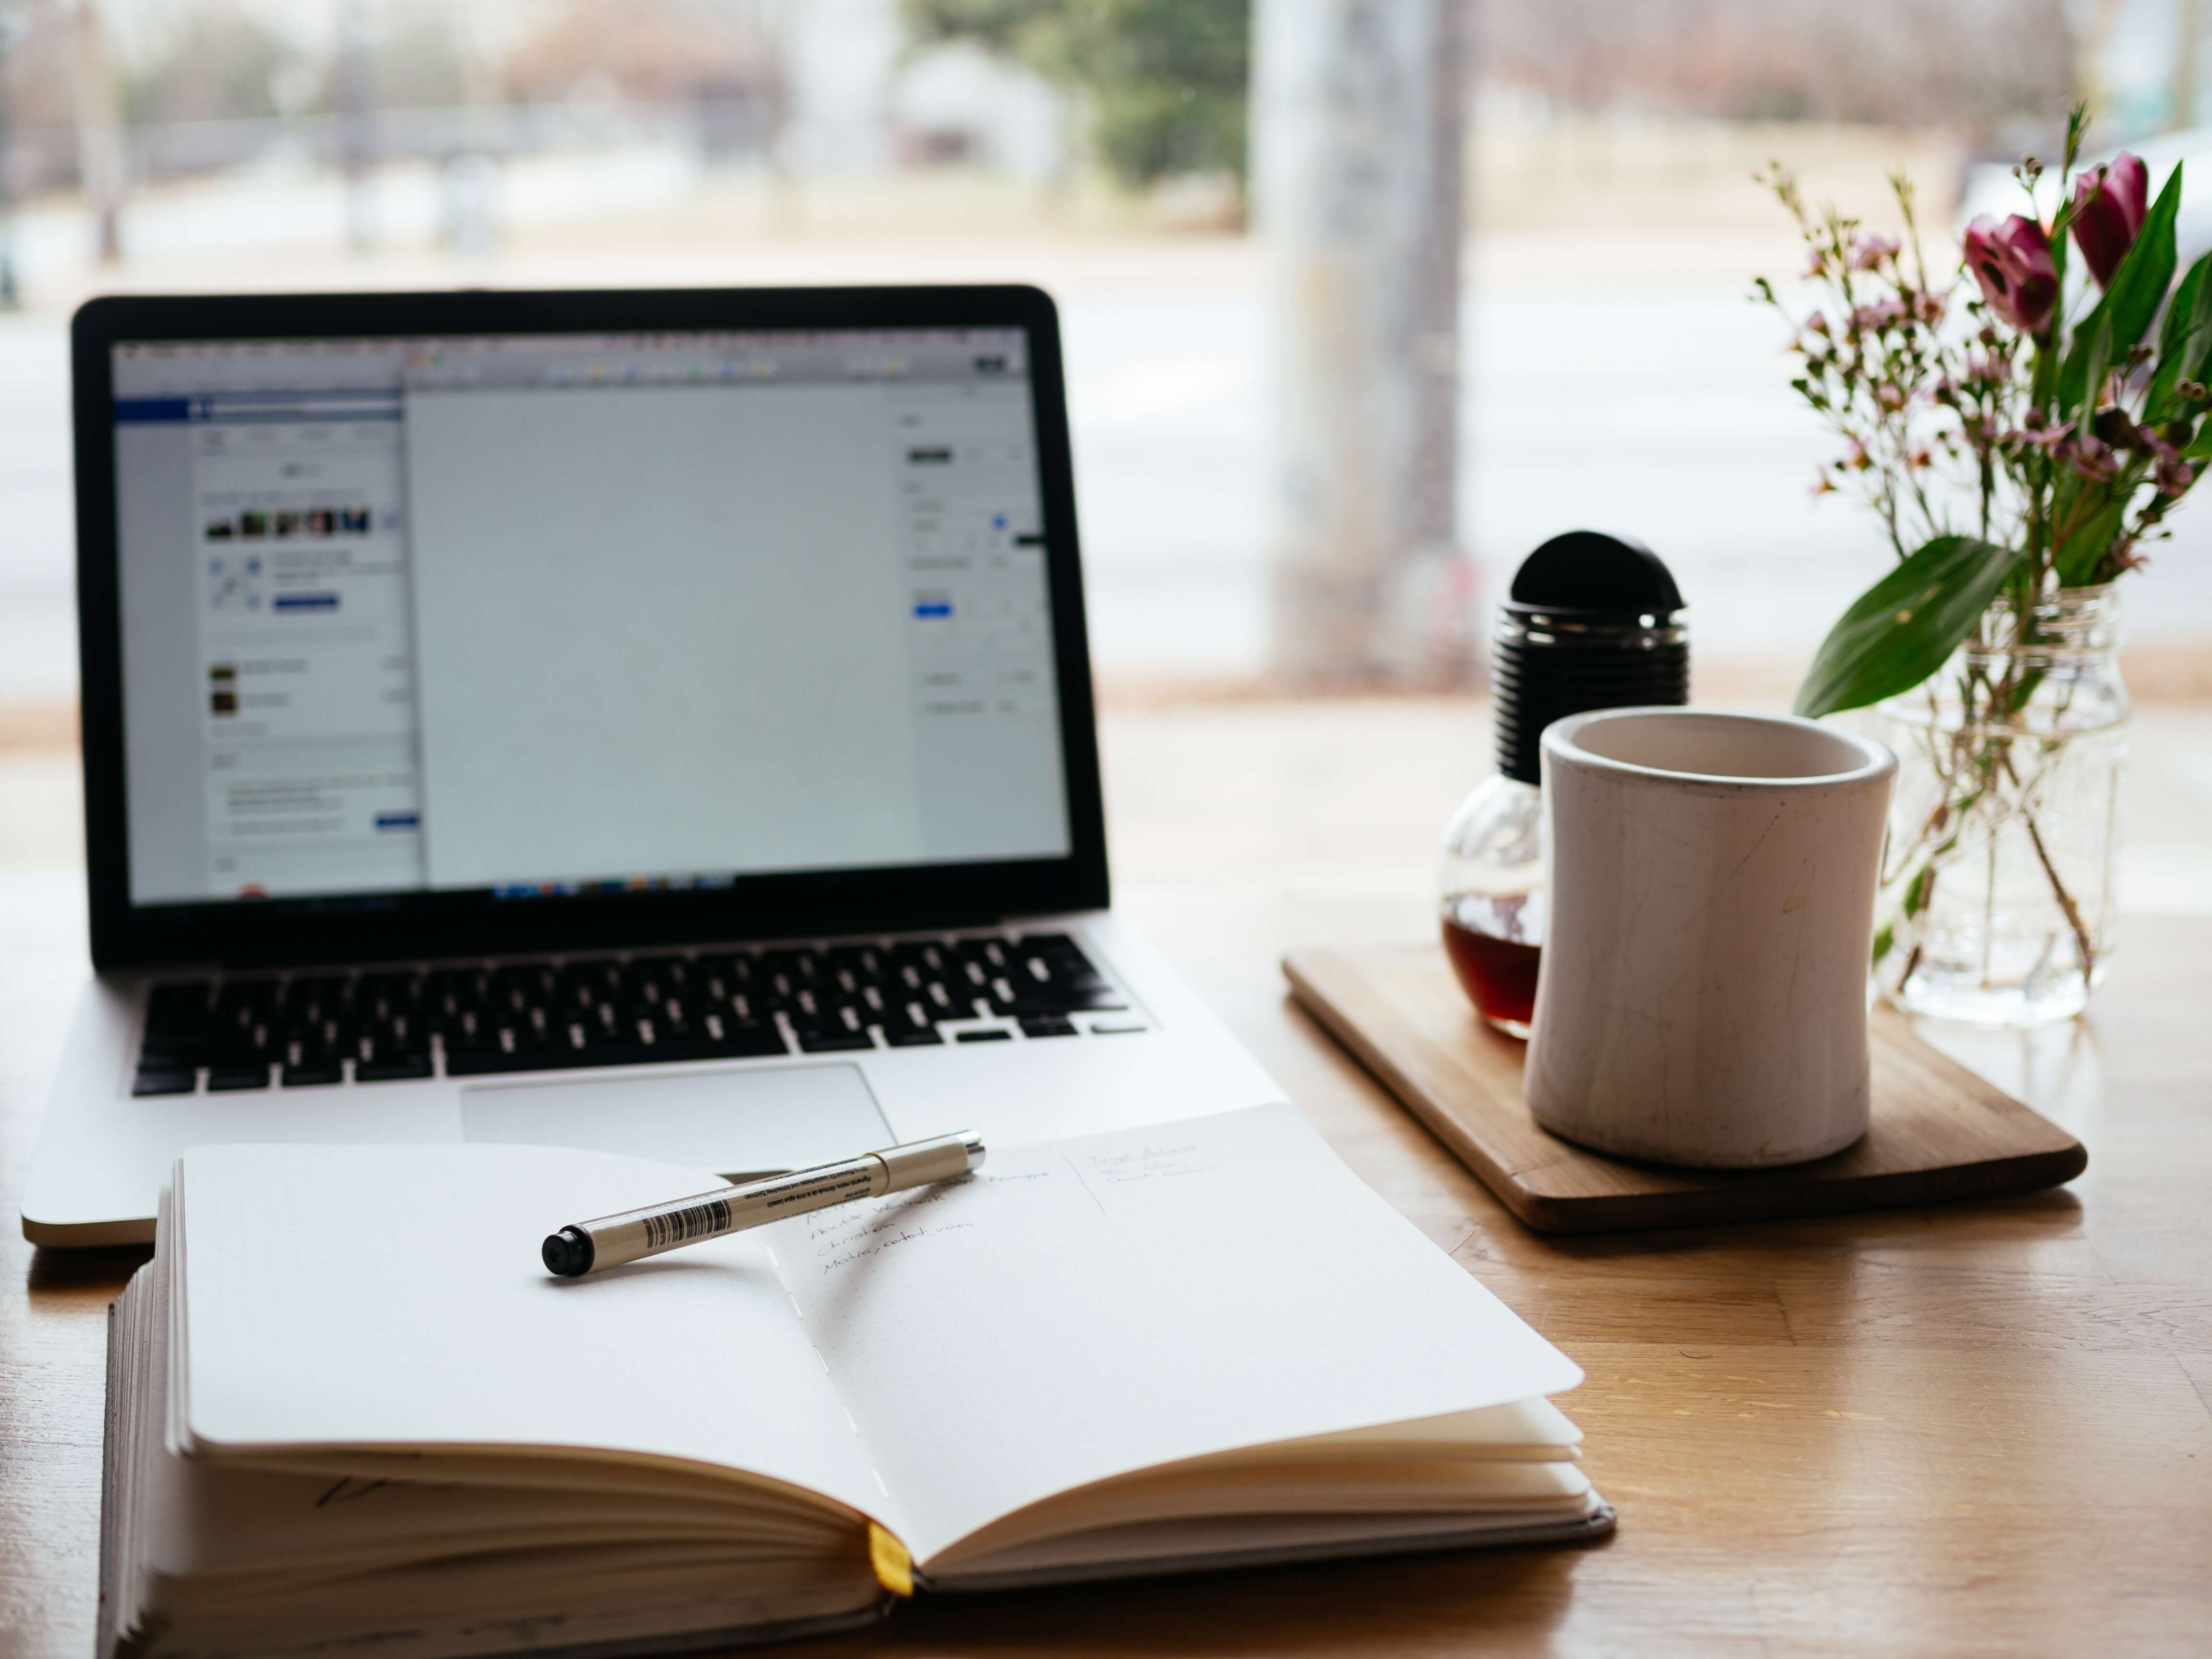 notebook-window-coffee